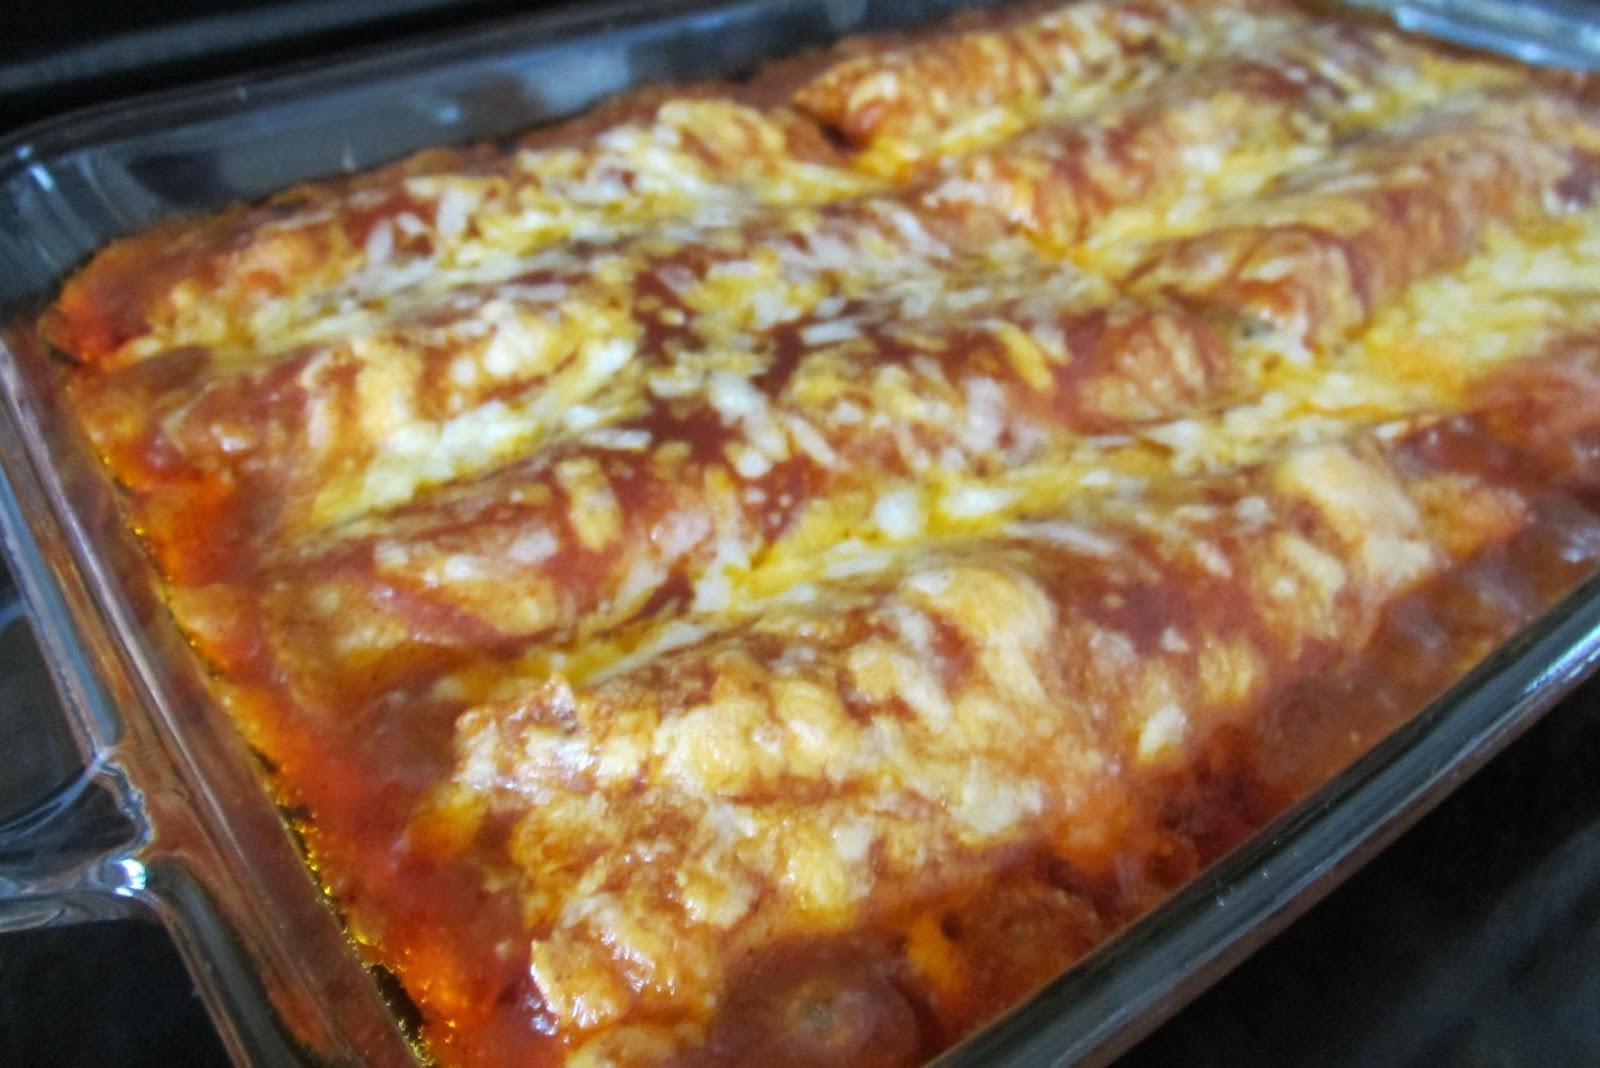 Gluten-Free Red Chili Enchiladas (w/ homemadesauce)